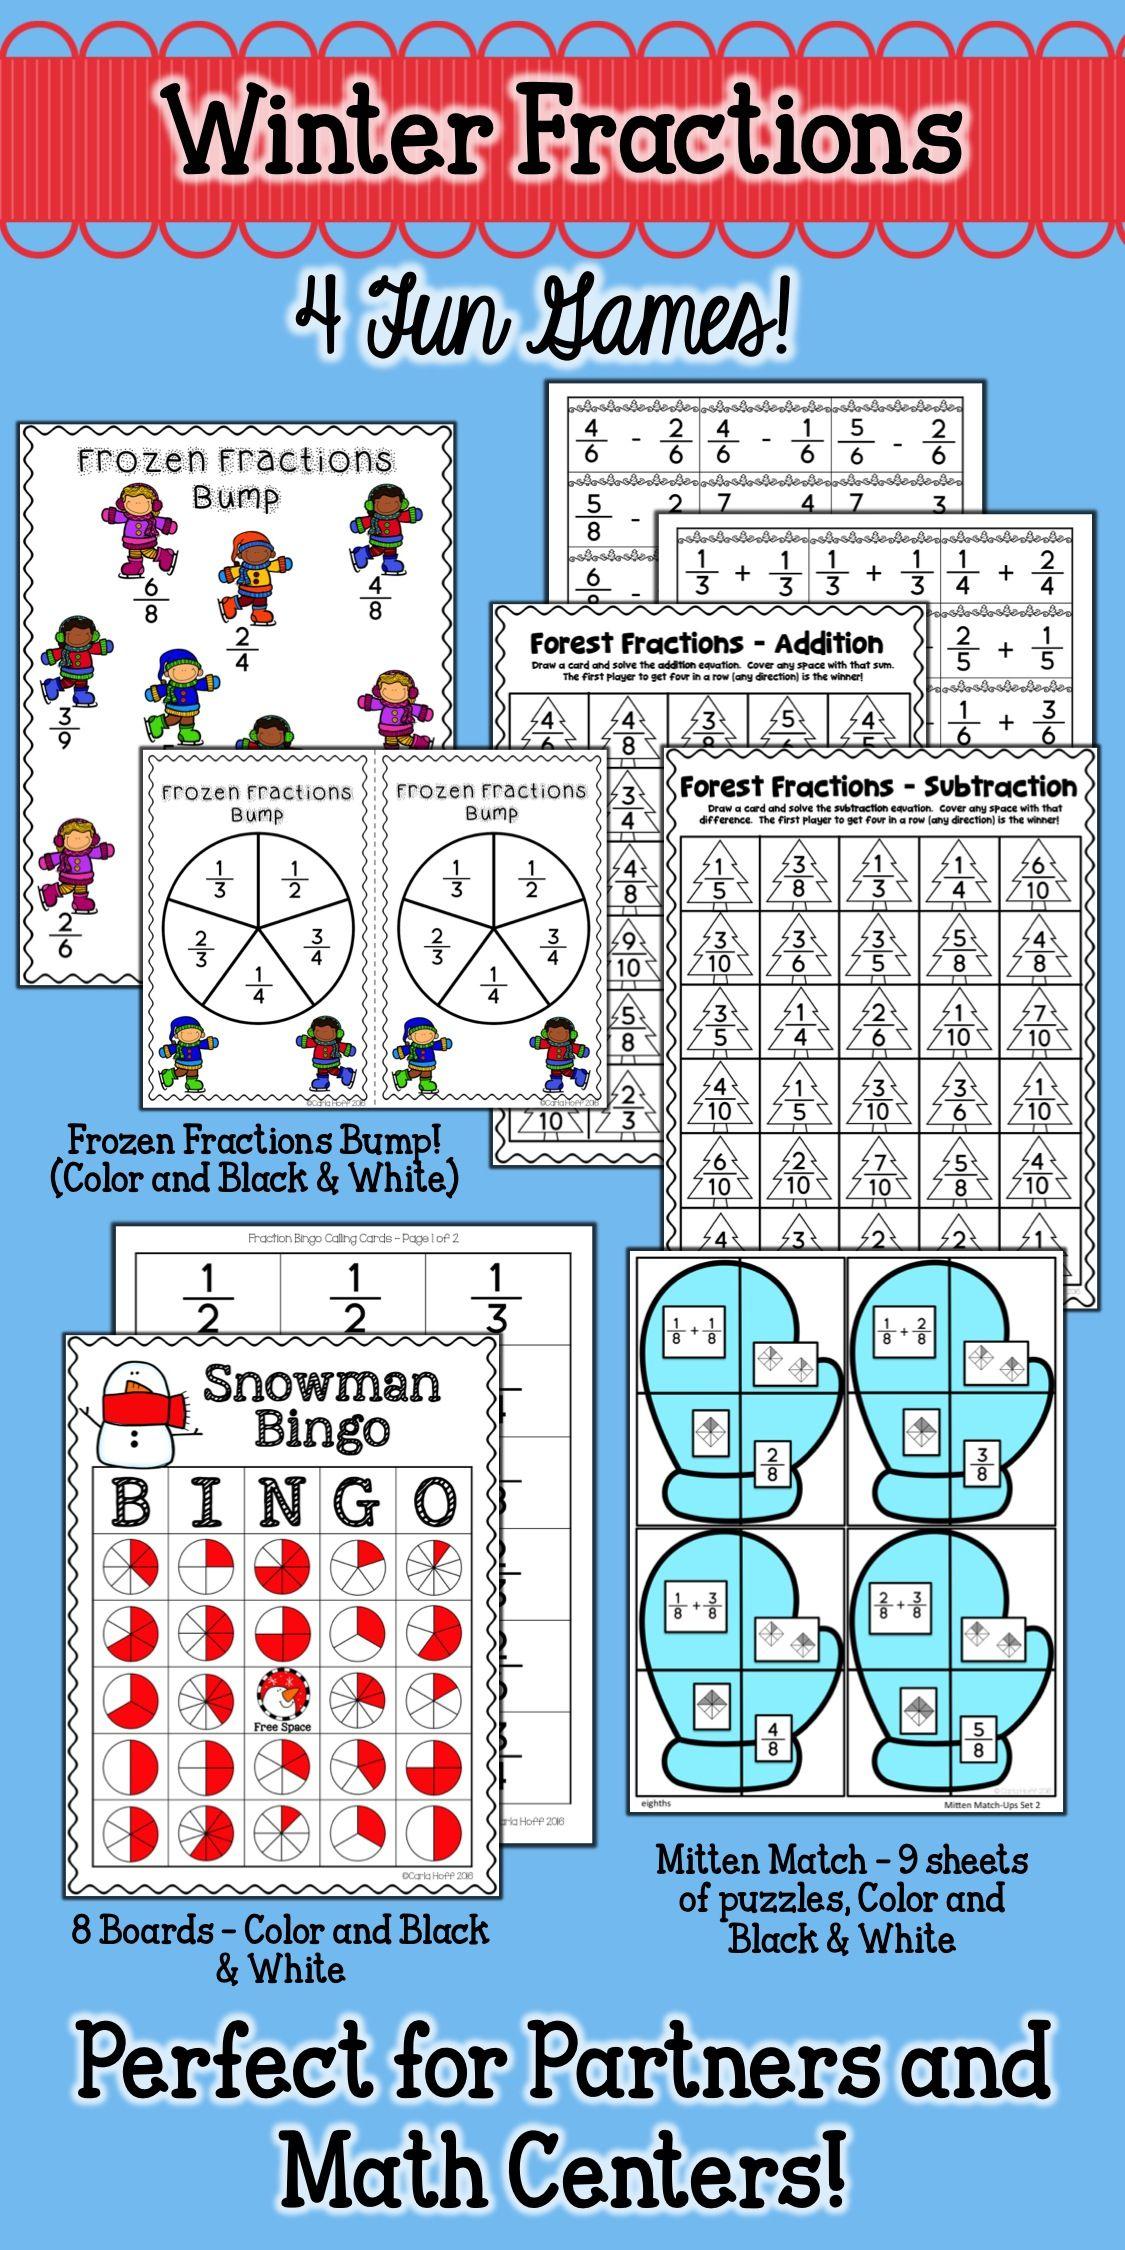 Winter Fractions Games